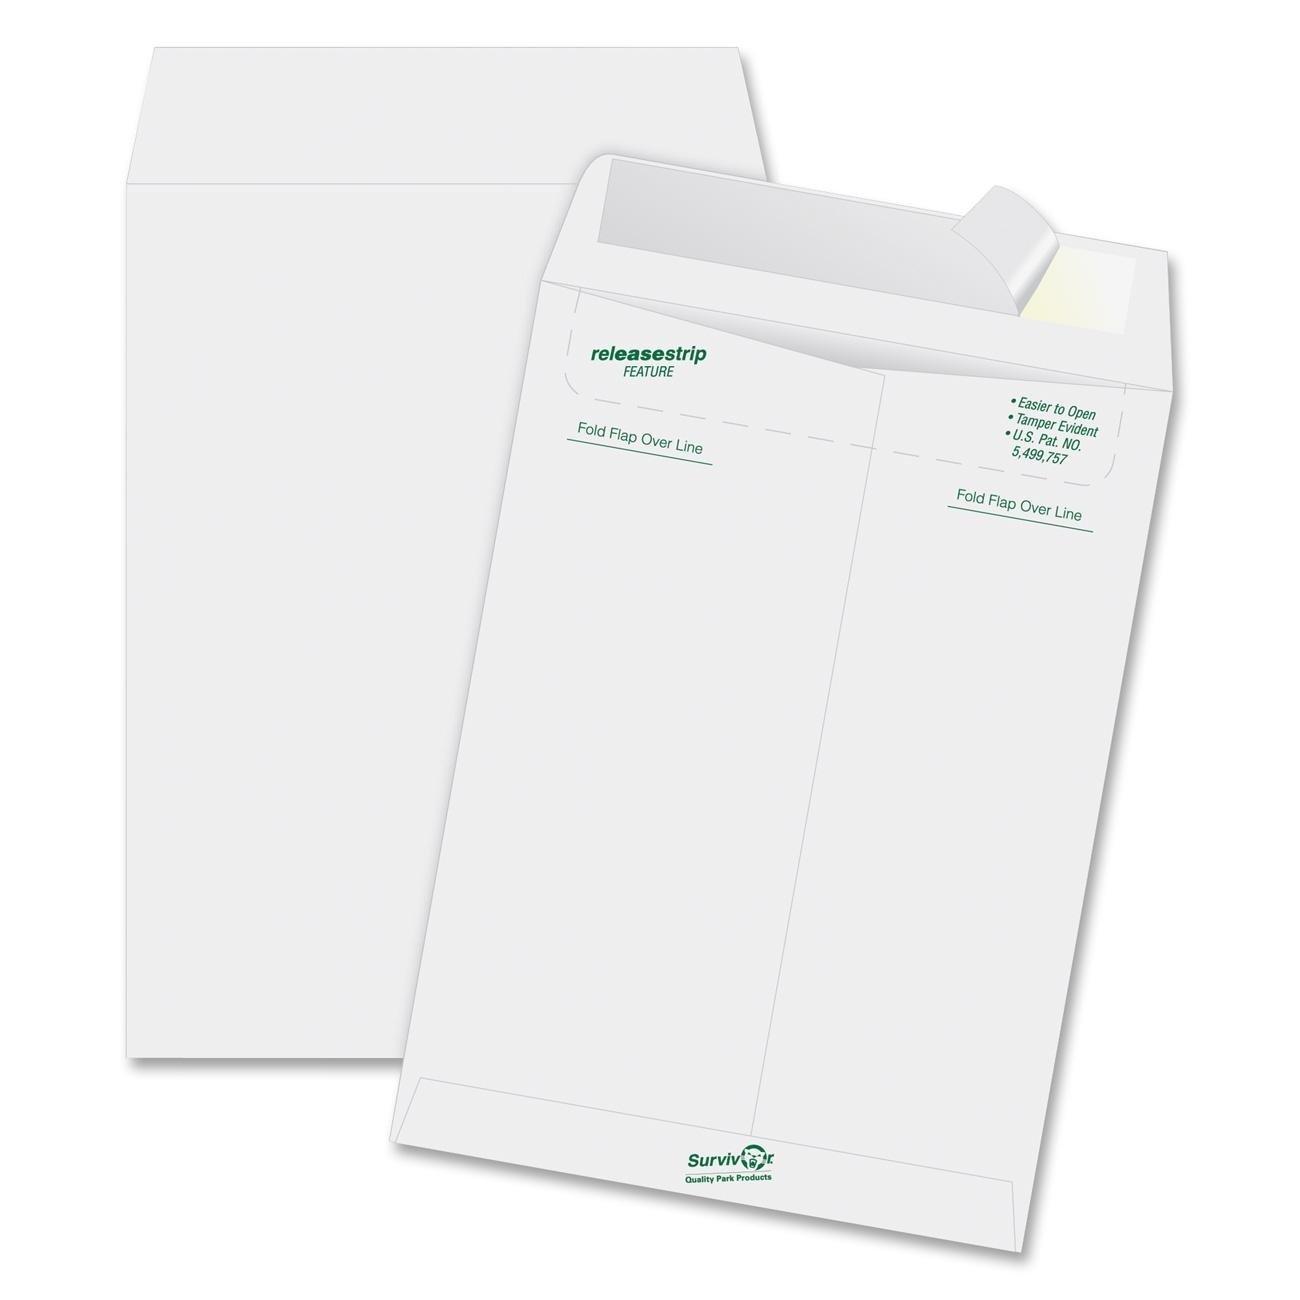 Quality park tyvek and tear resistant envelopes 10 x 13 for 10 x 13 window envelope